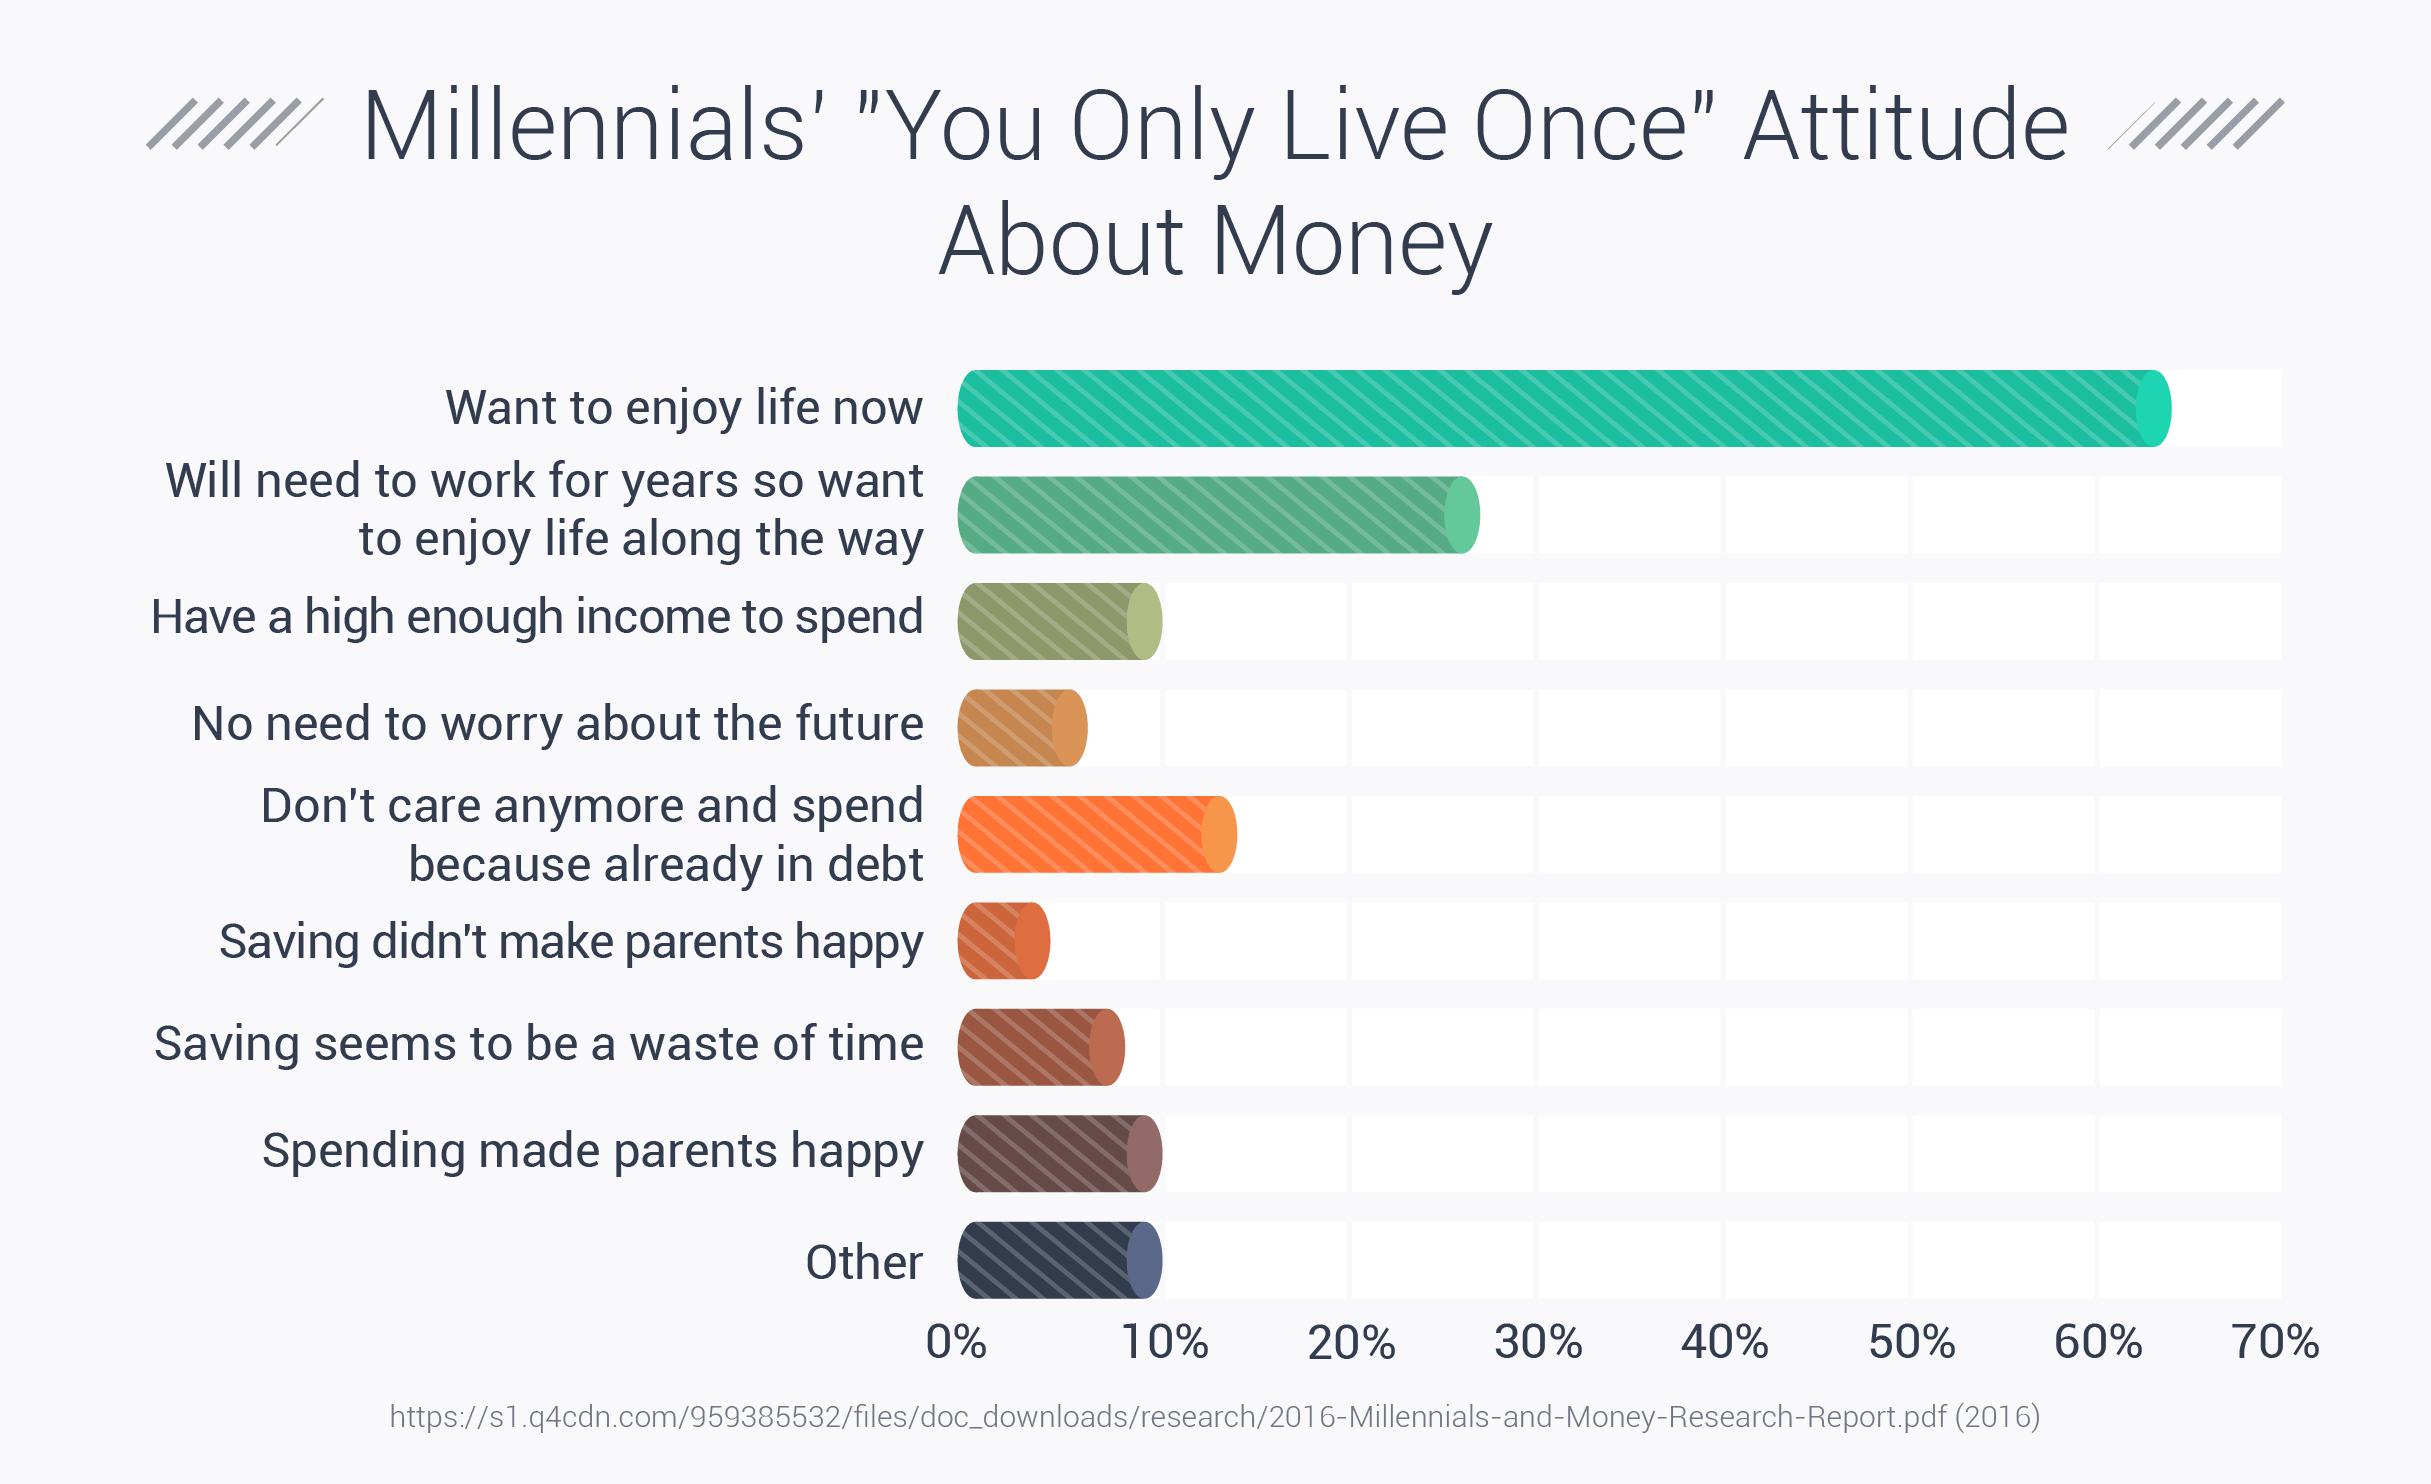 Millennials' YOLO Attitude About Money